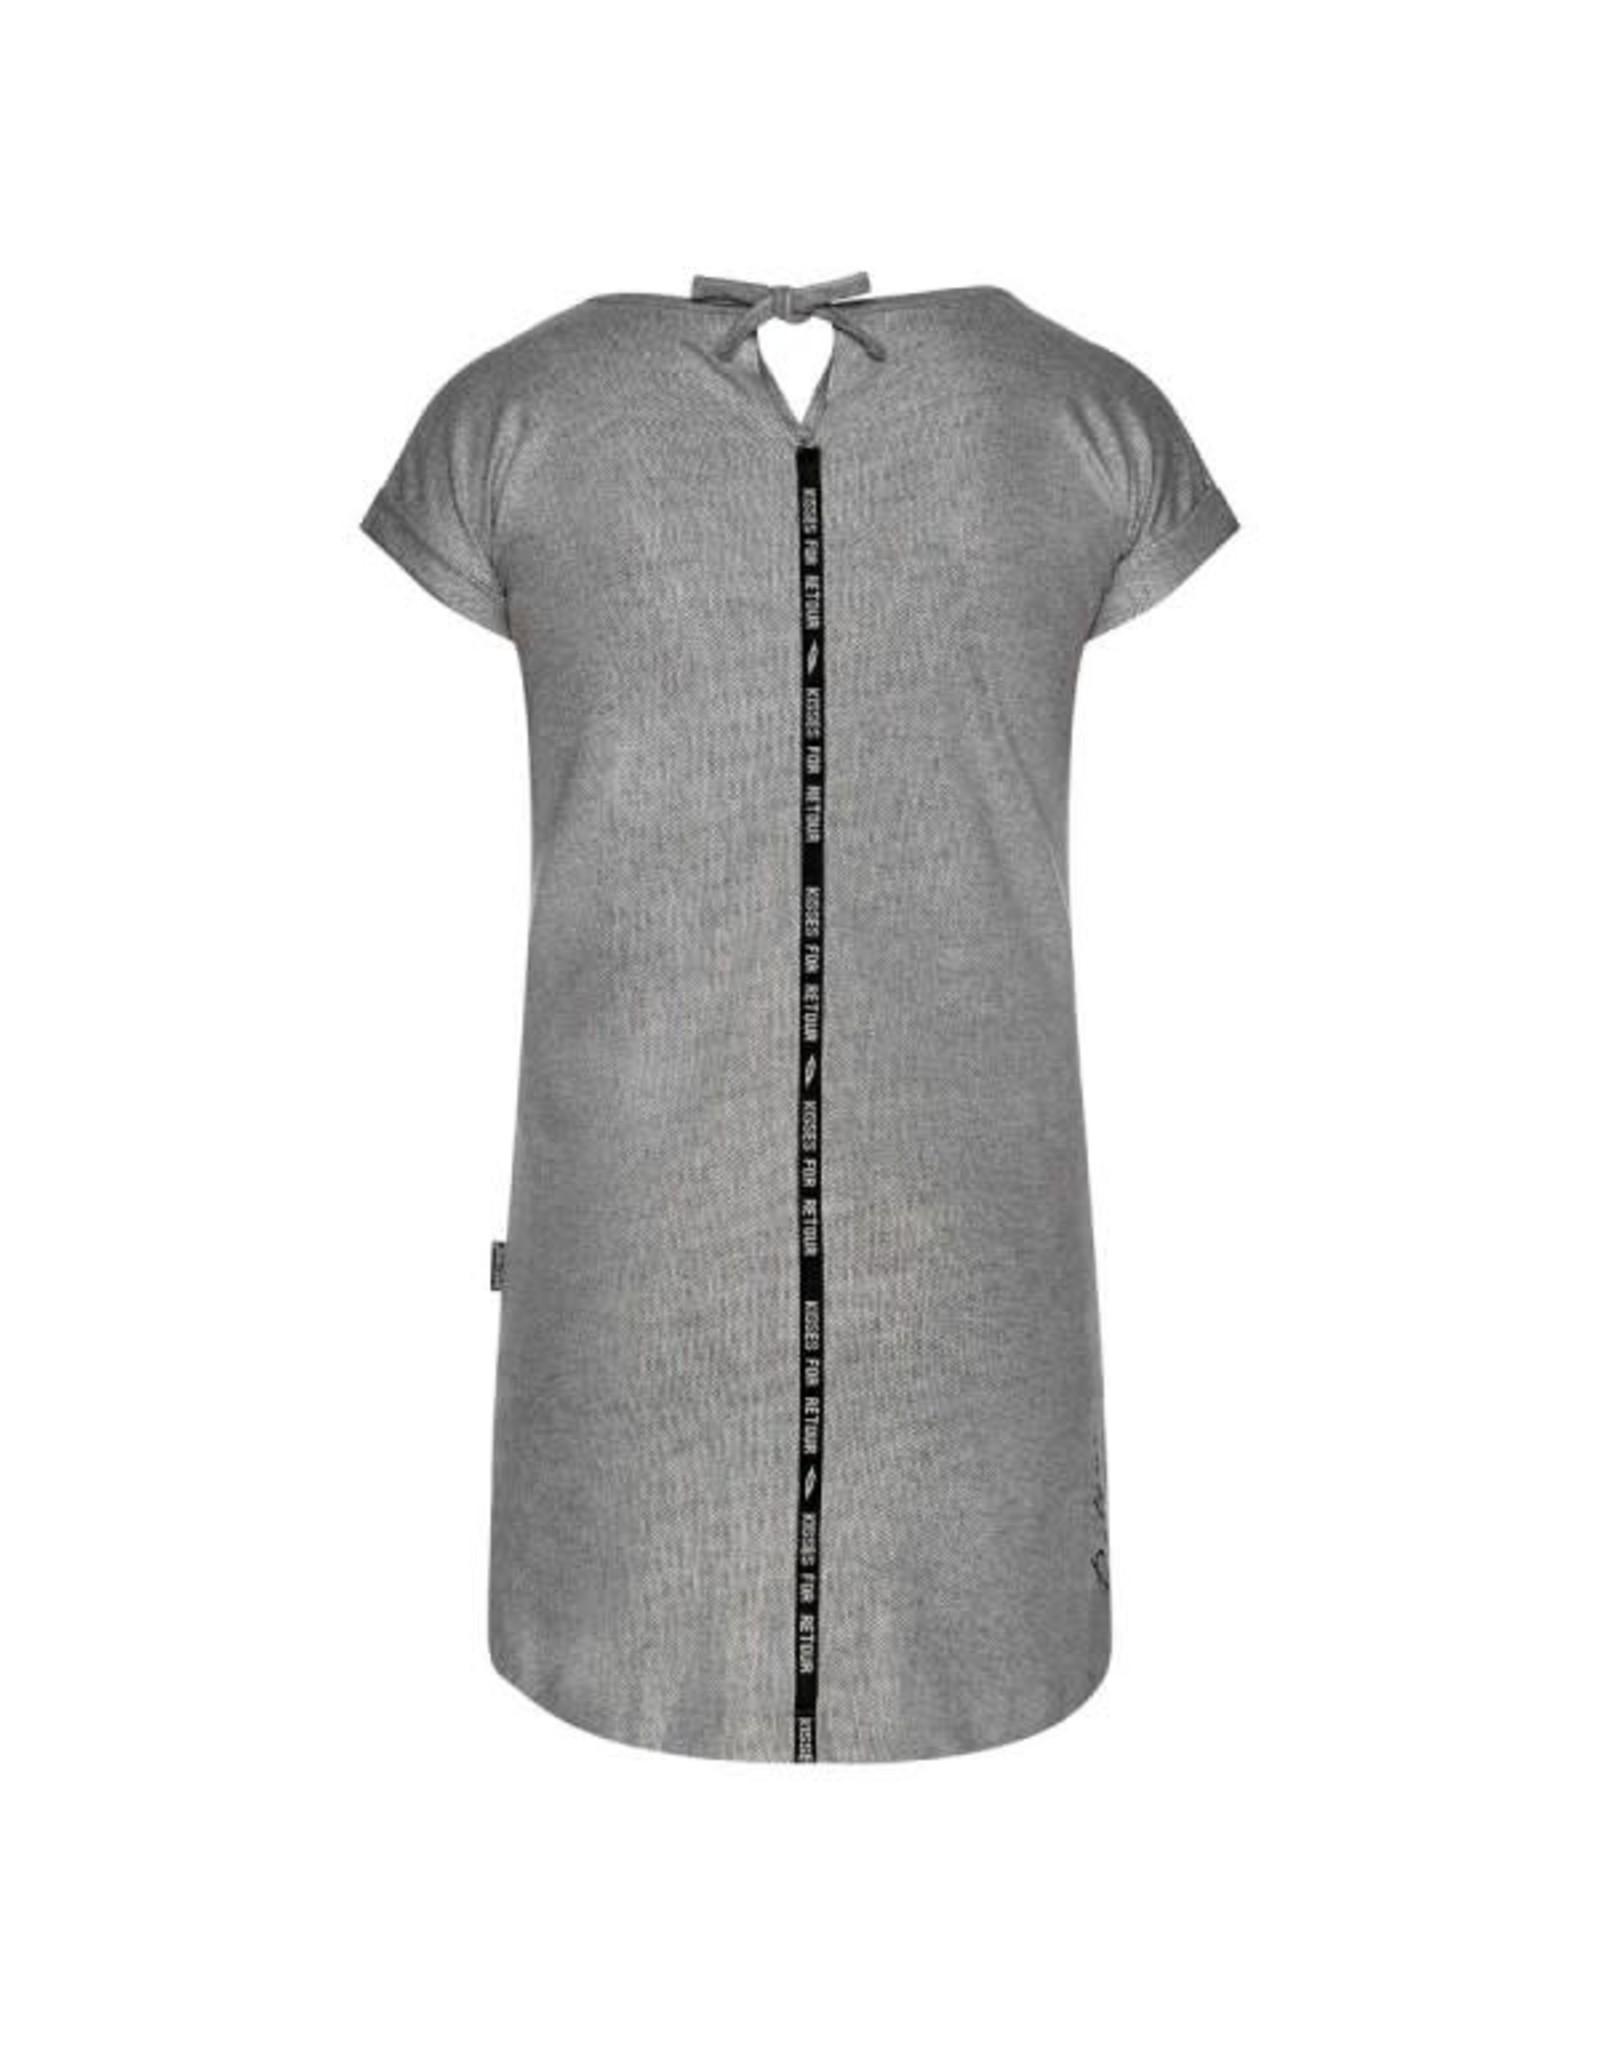 Retour Elisa T-shirt 1098 silver